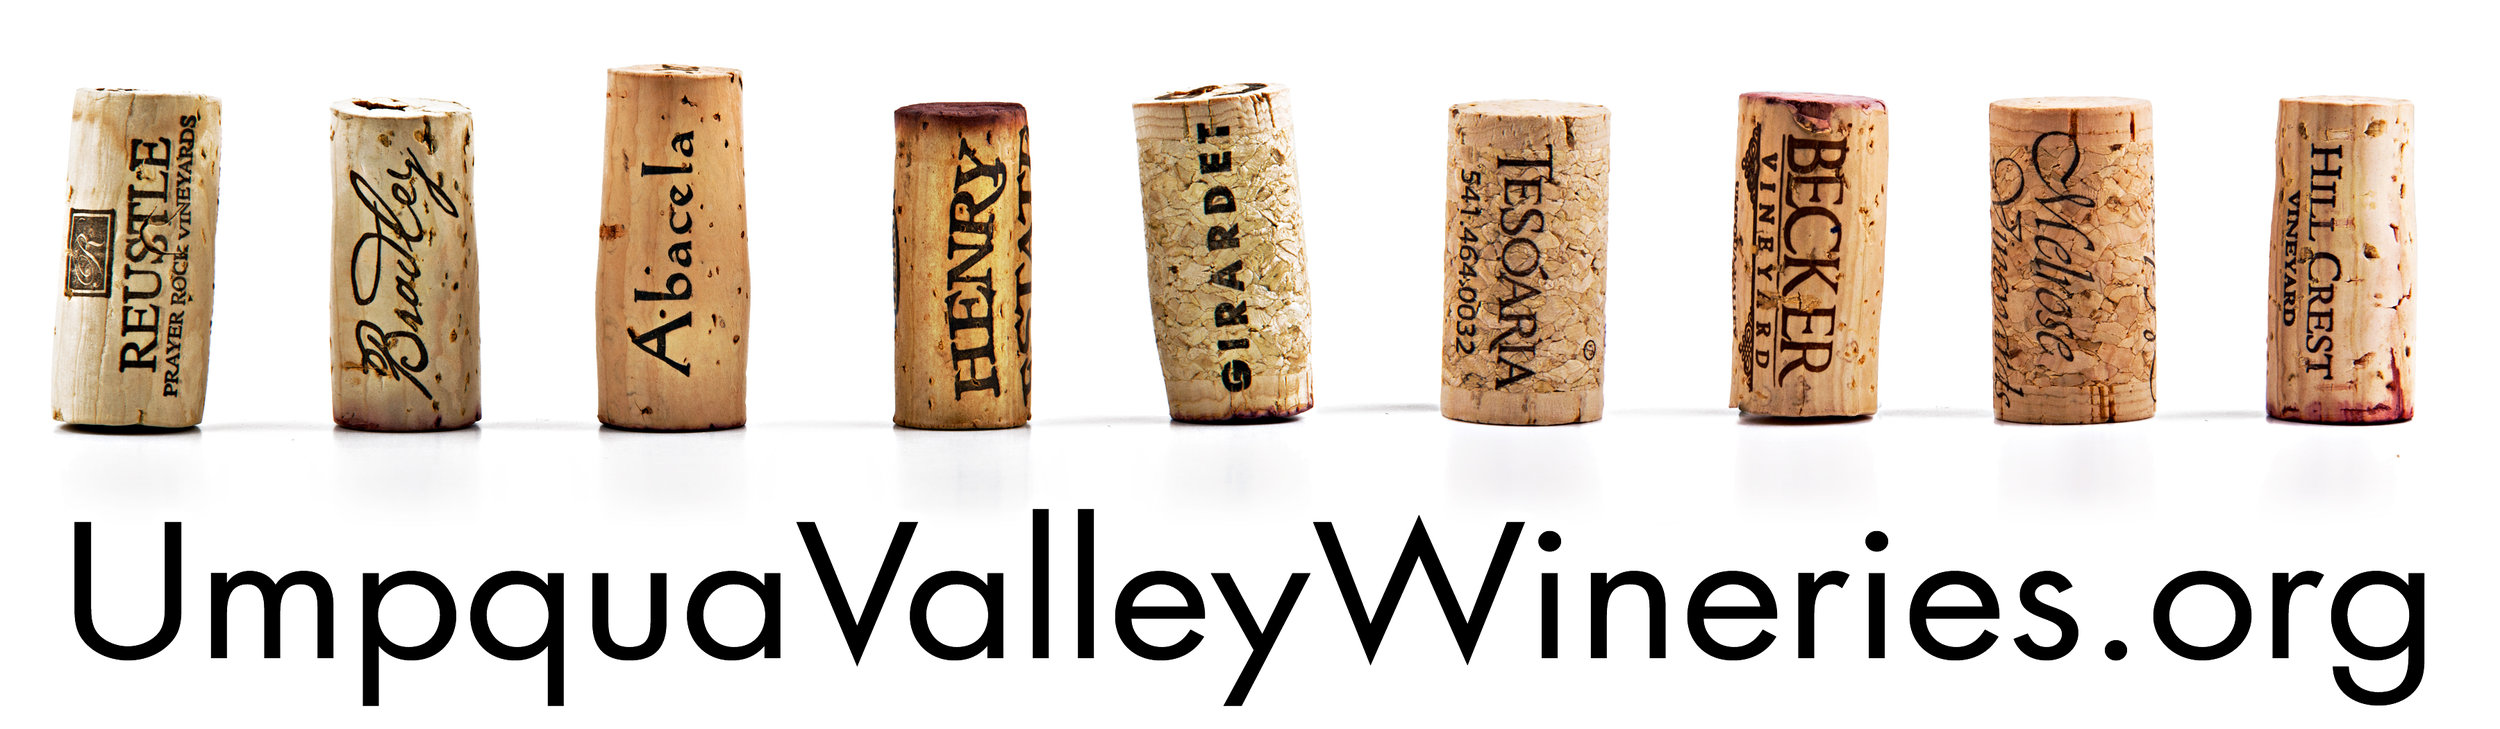 Billboard for Umpqua Valley Wine Association.